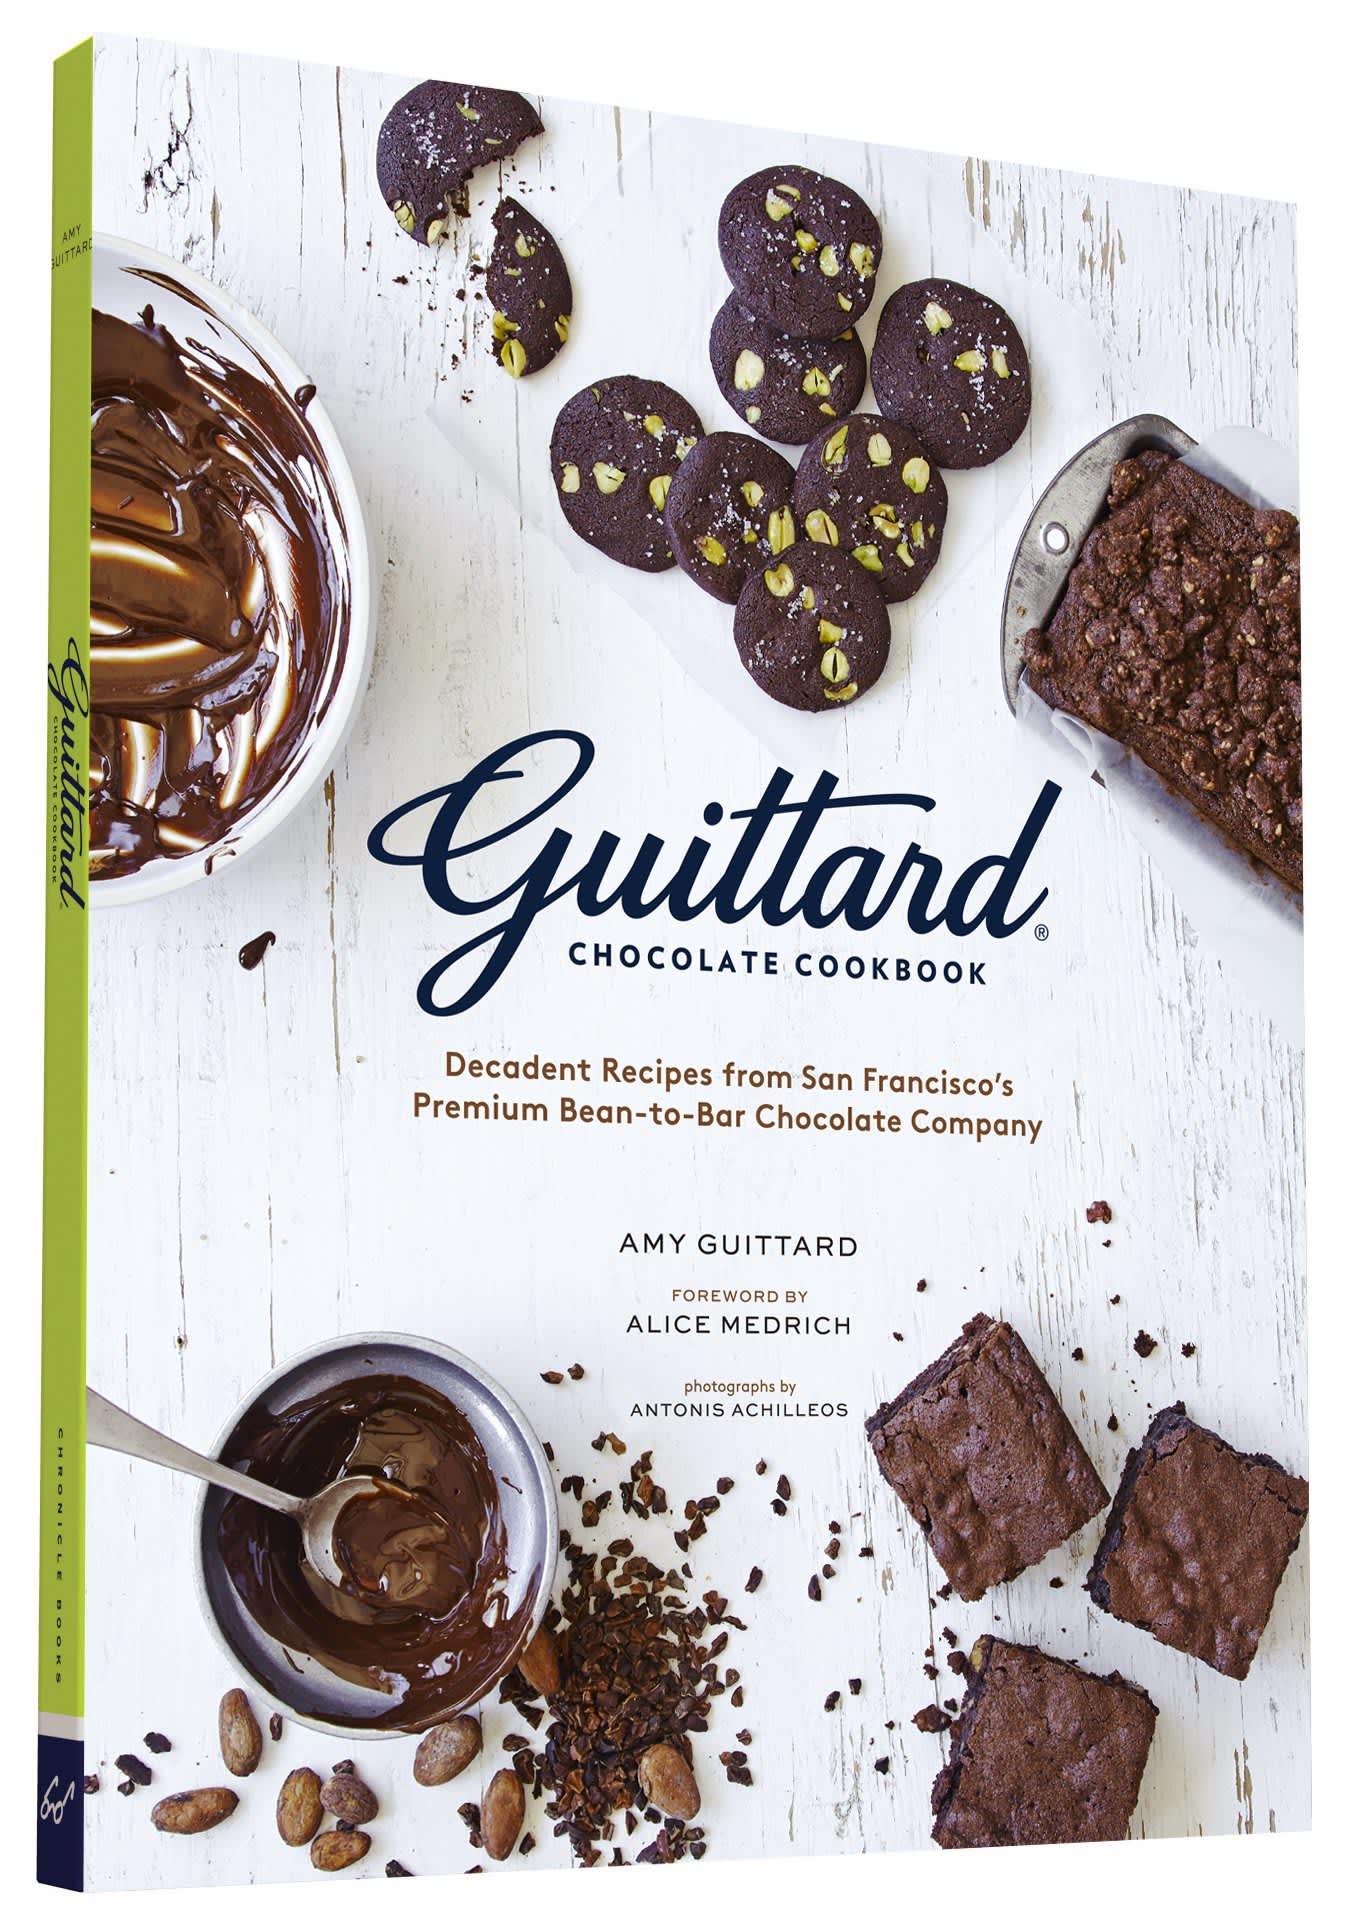 Guittard by Amy Guittard